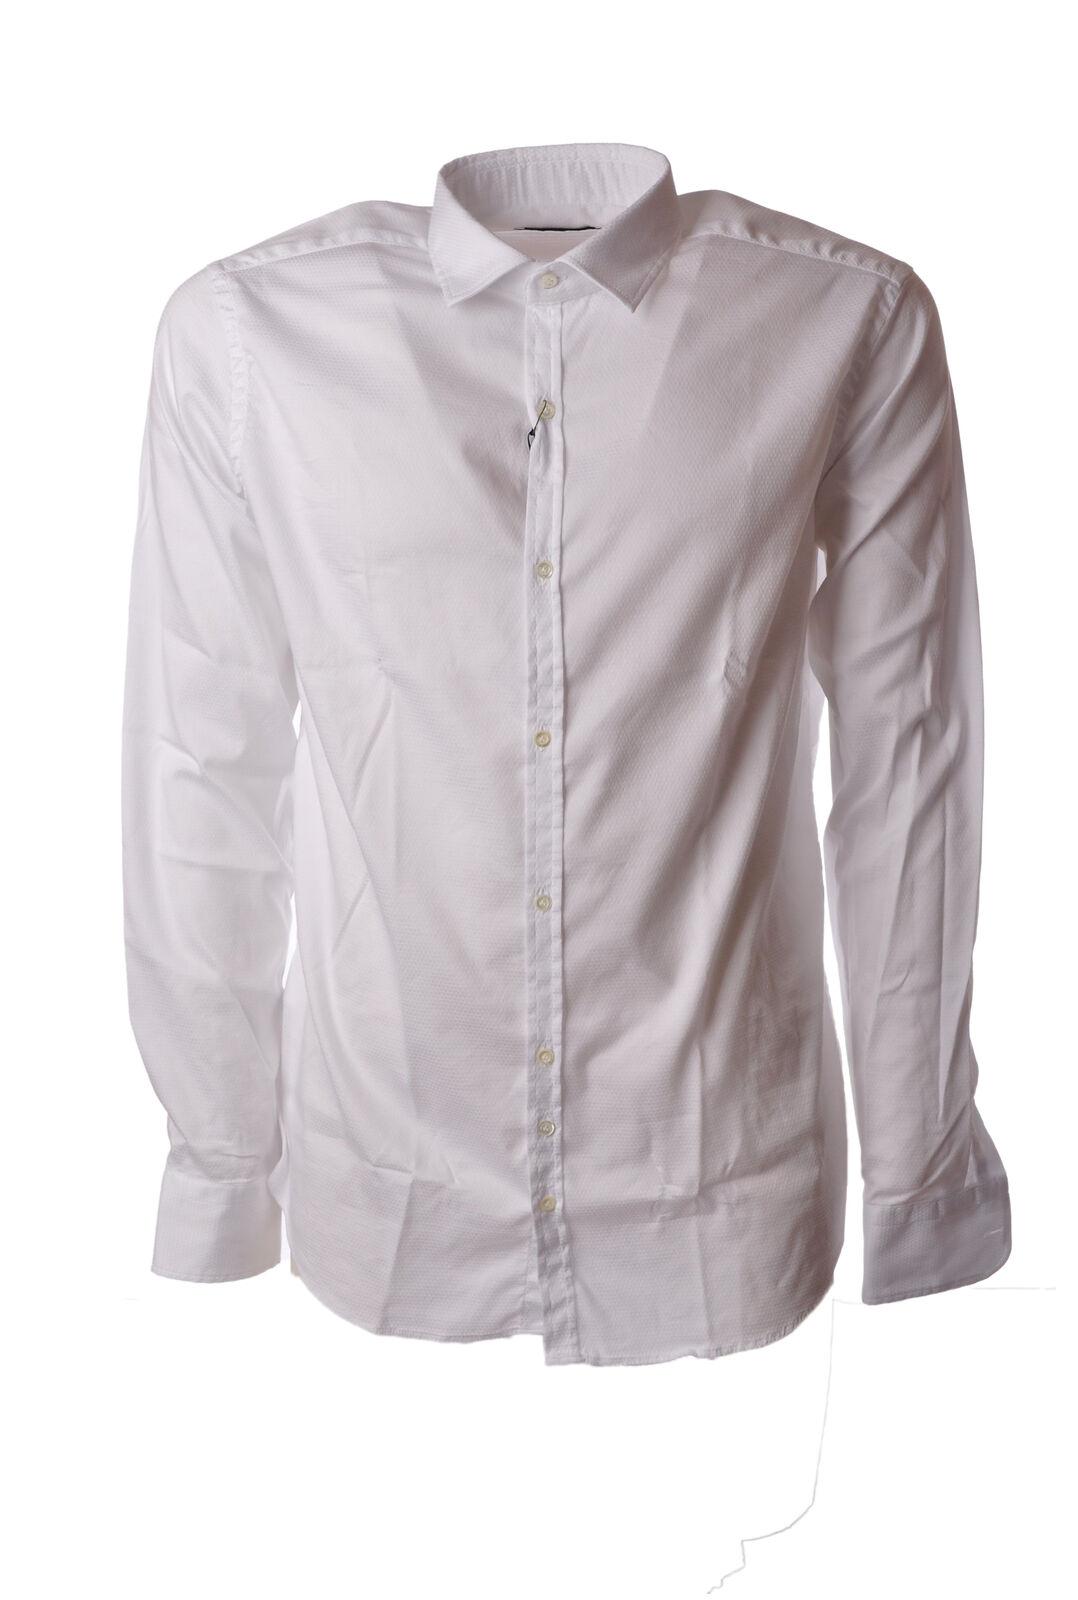 Aglini - Shirts-Shirt - Man - White - 5047620F184419